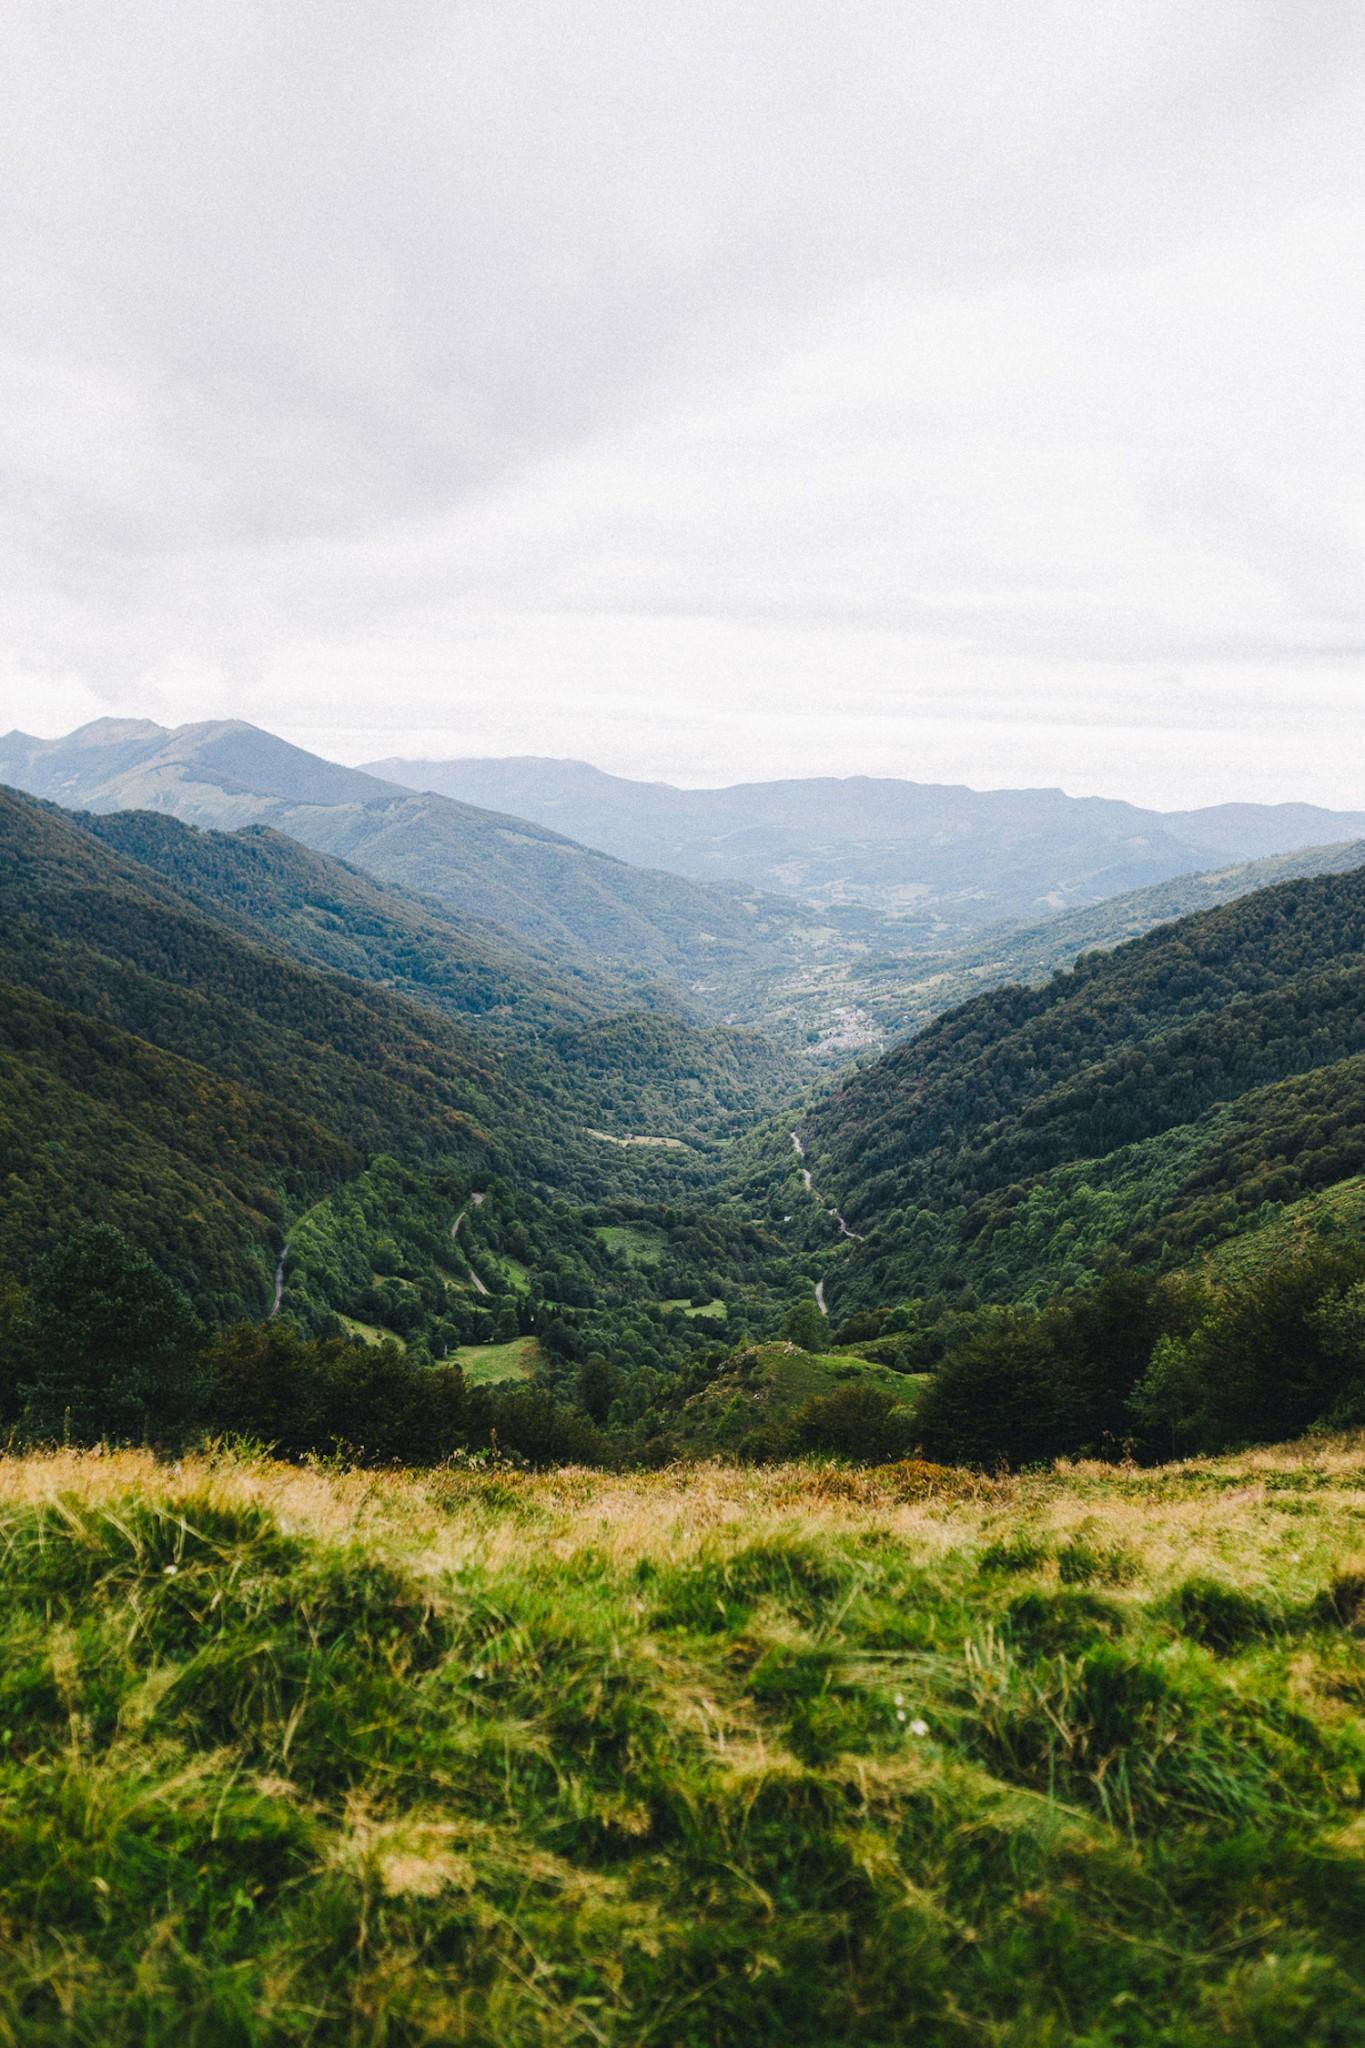 randonnee-au-lac-d-ayes-pyrenees-ariegeoises-rose-fushia-photographie184